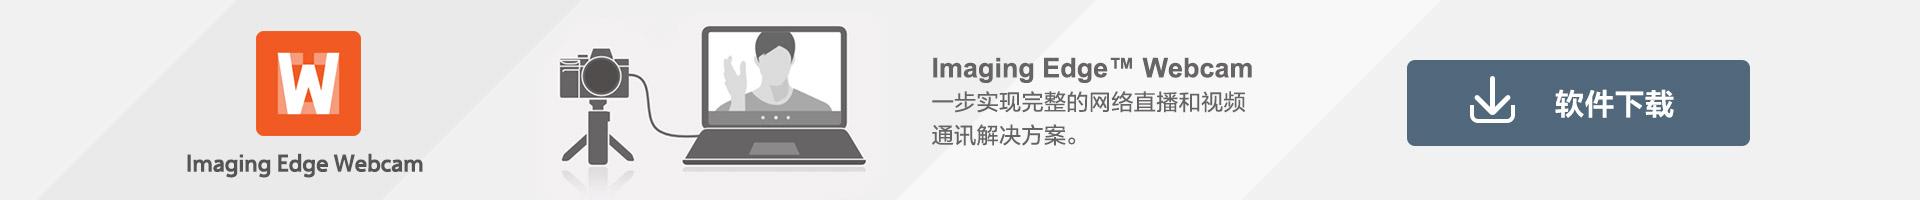 Imaging Edge Webcam